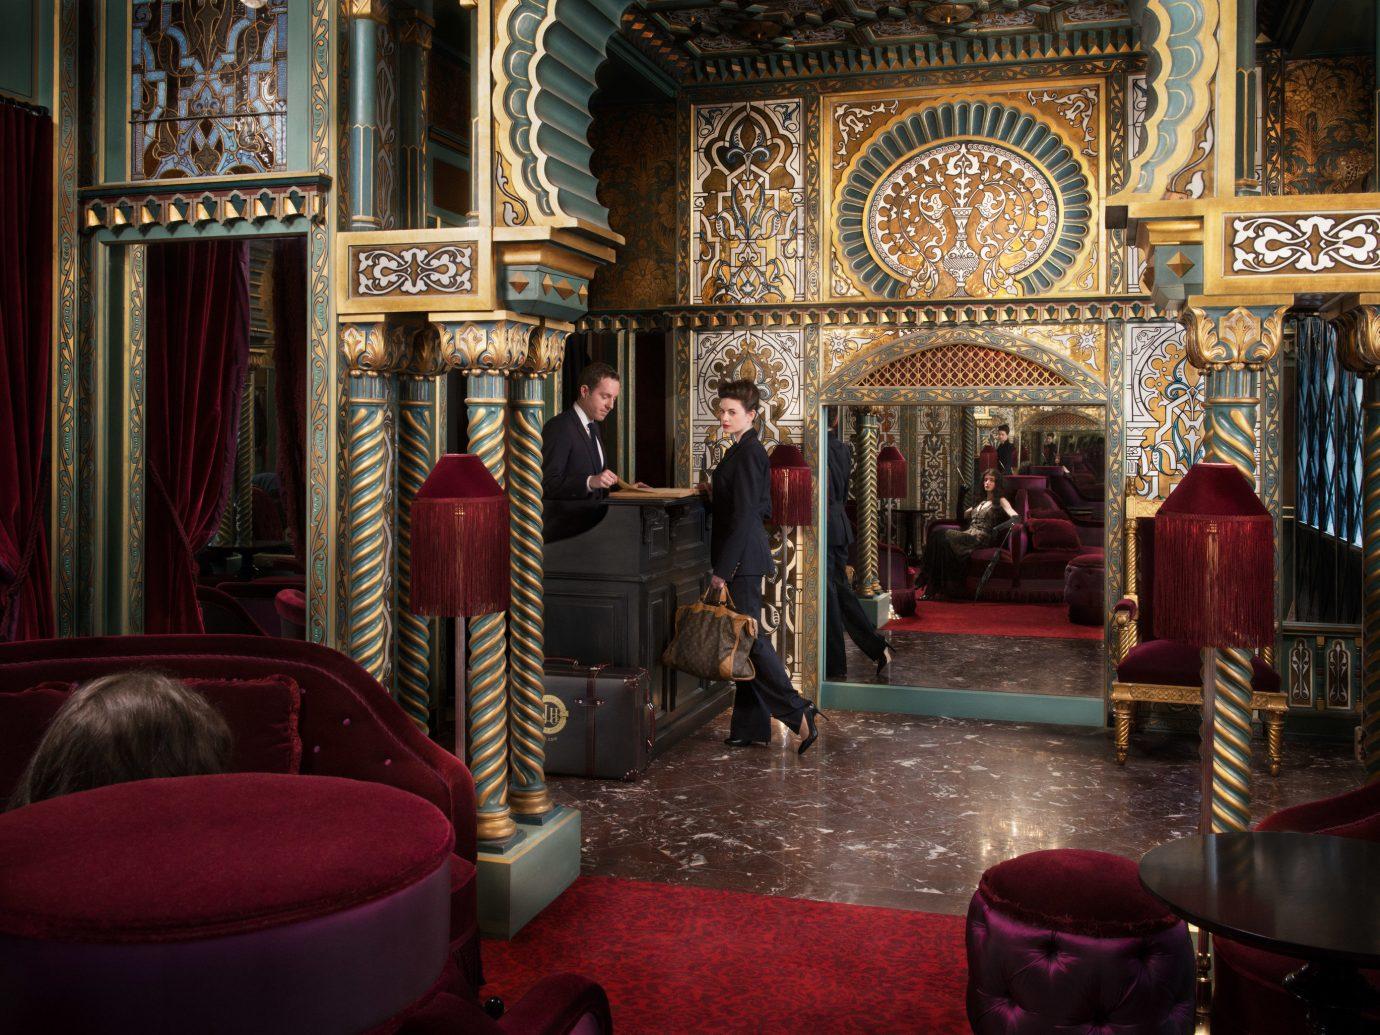 France Hotels Paris indoor room chair altar furniture